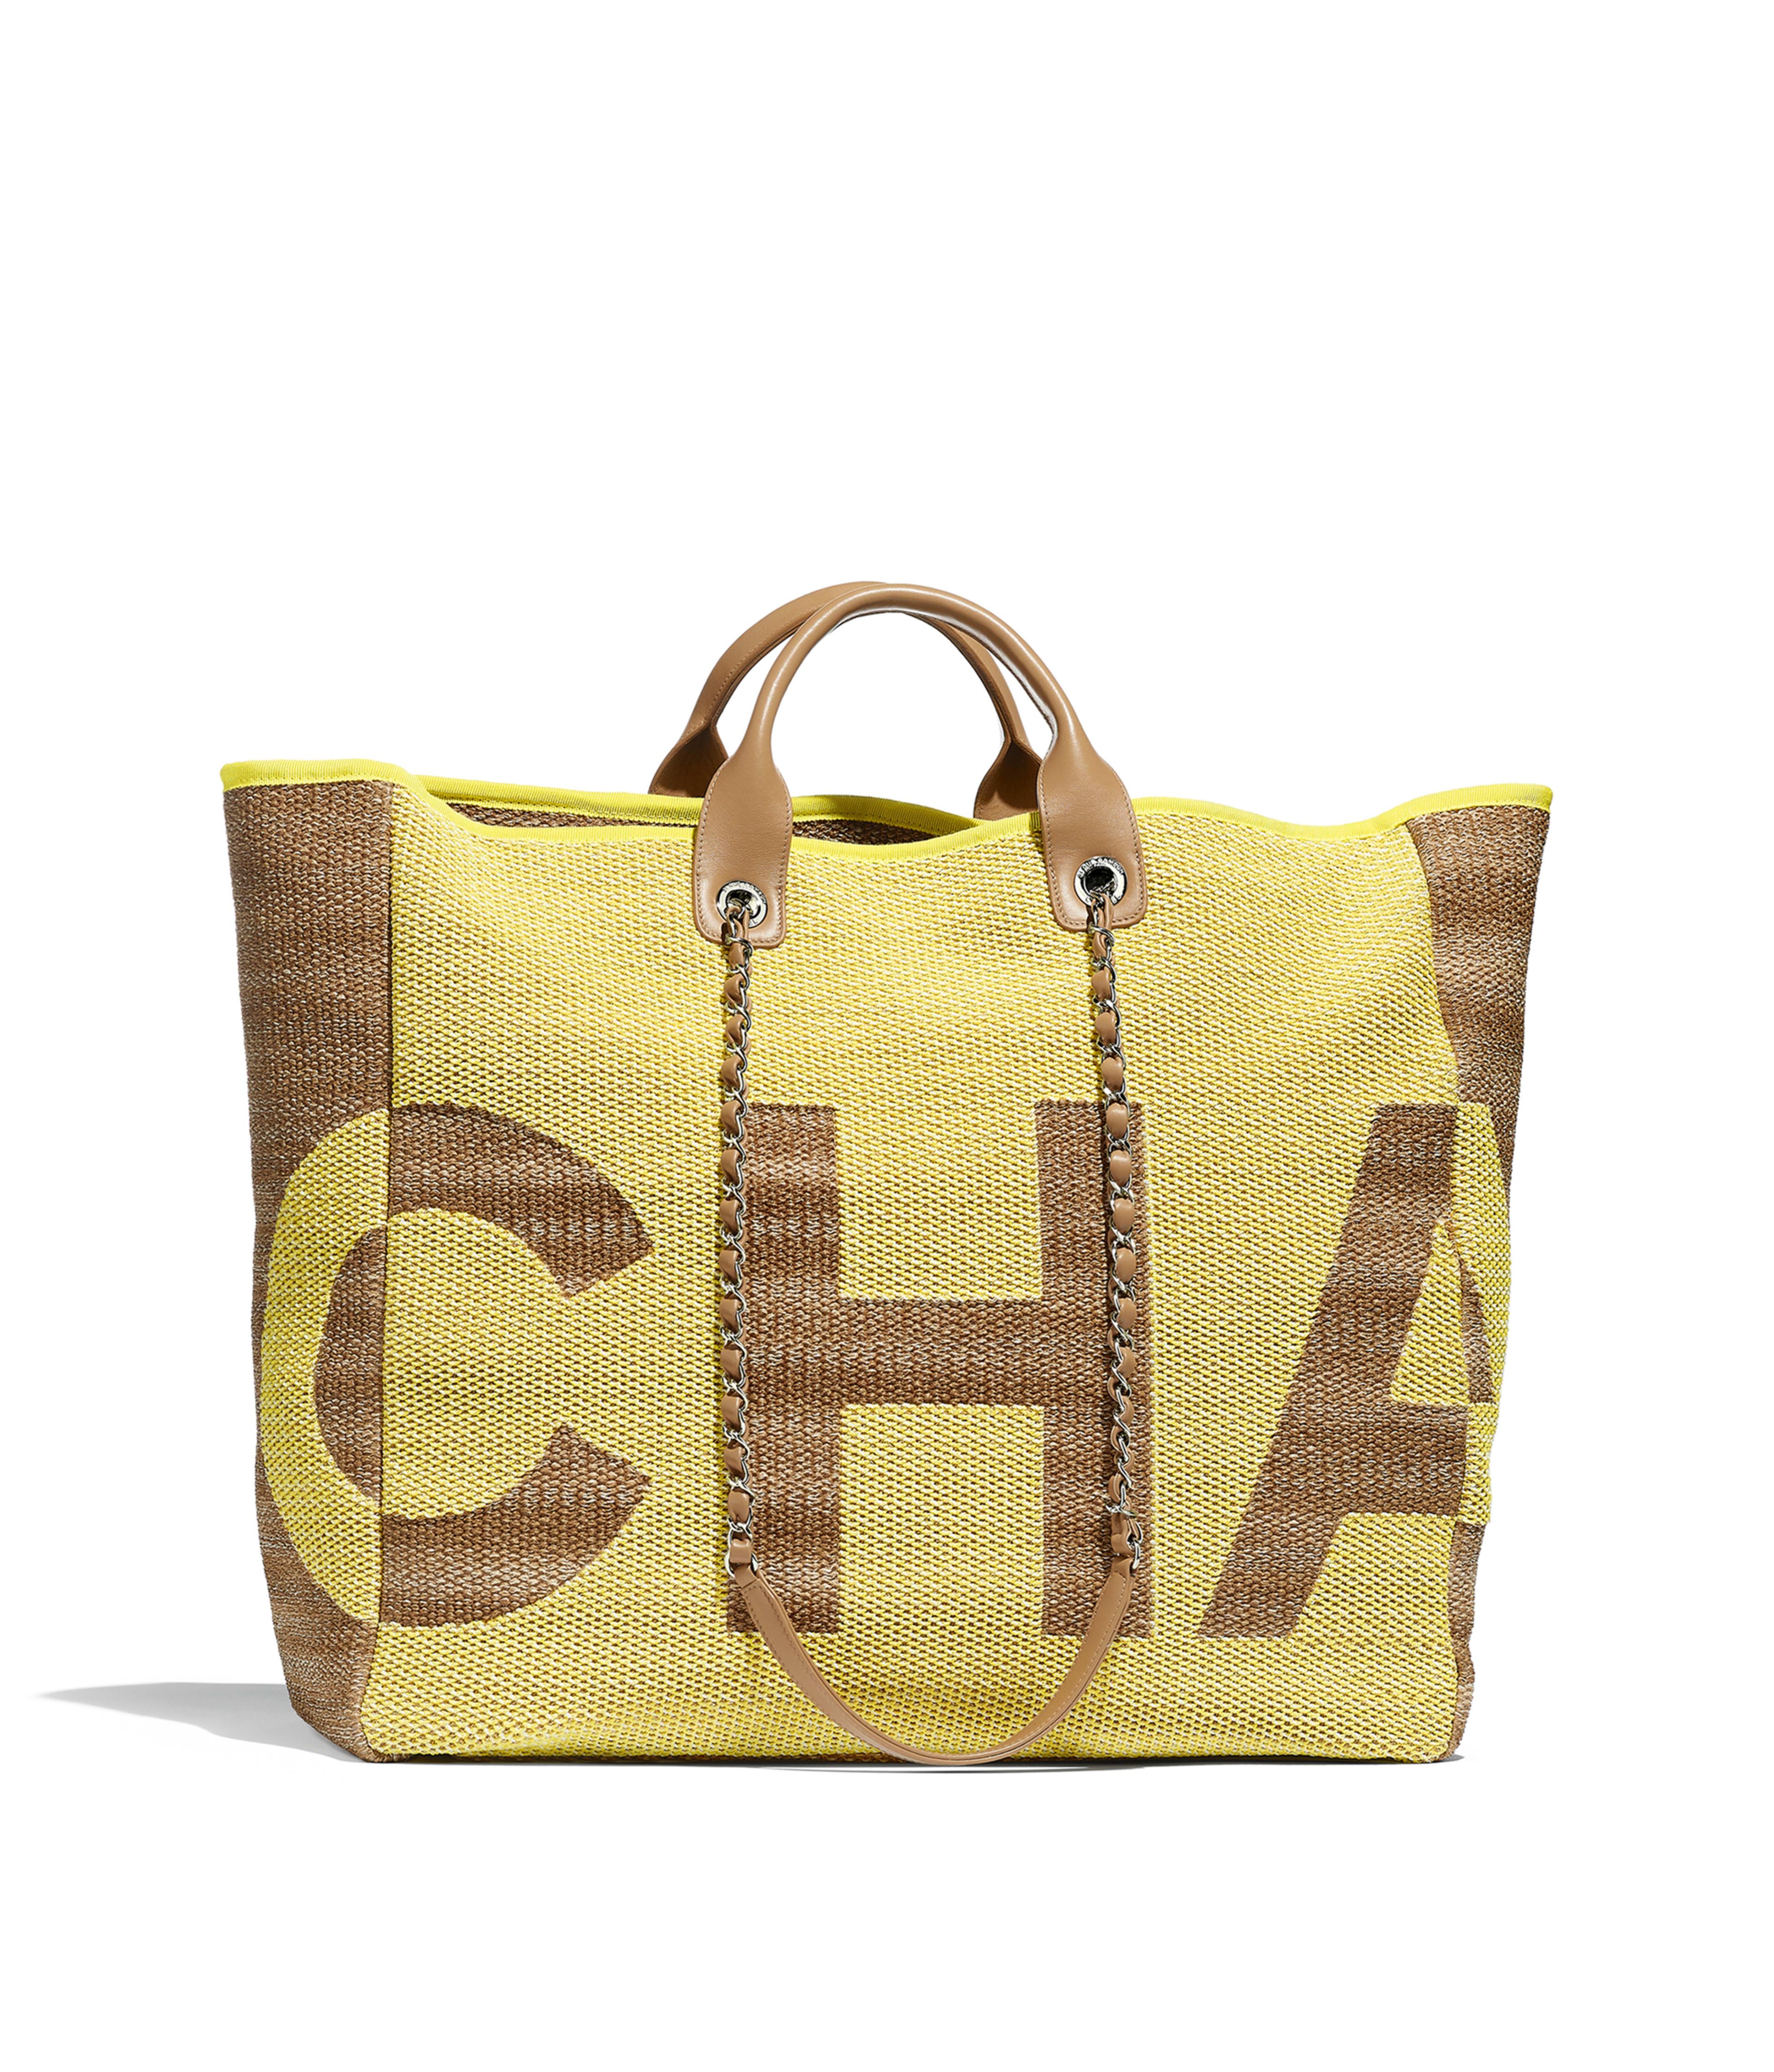 6c8823445b05 Large Shopping Bag Mixed Fibers